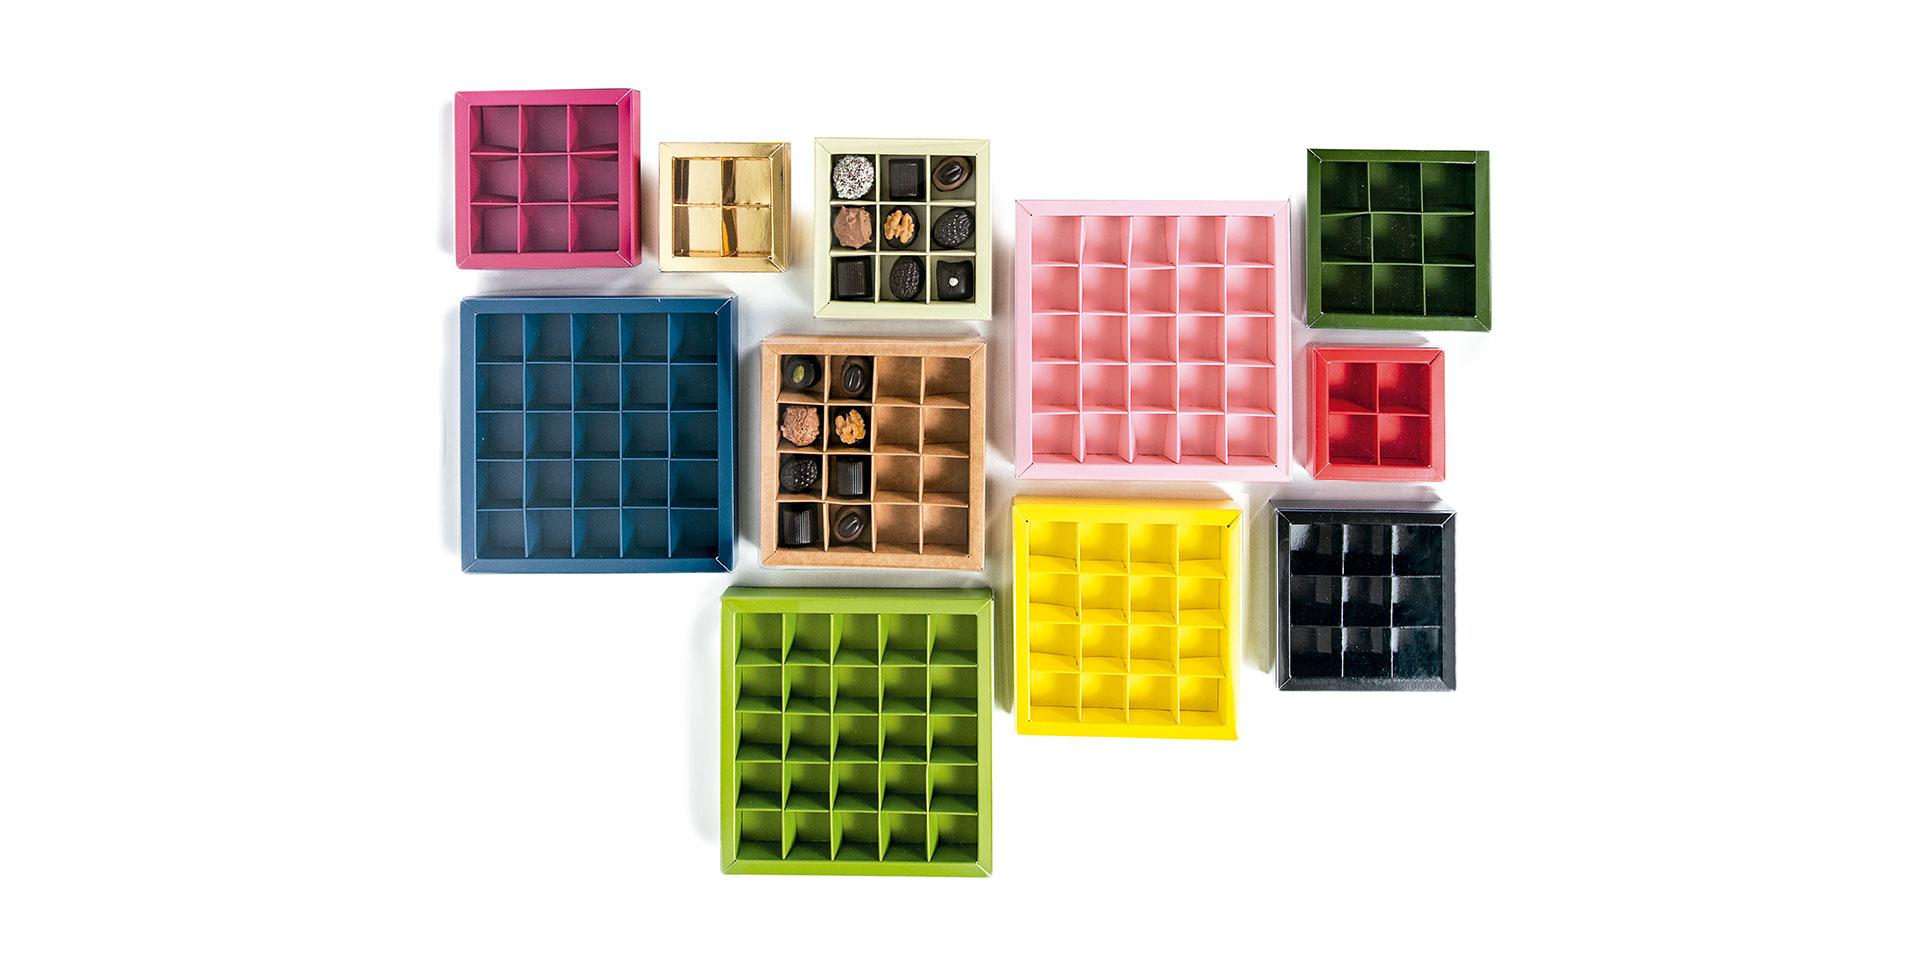 ChocoBox-cajas-estandar-para-bombones-2.jpg